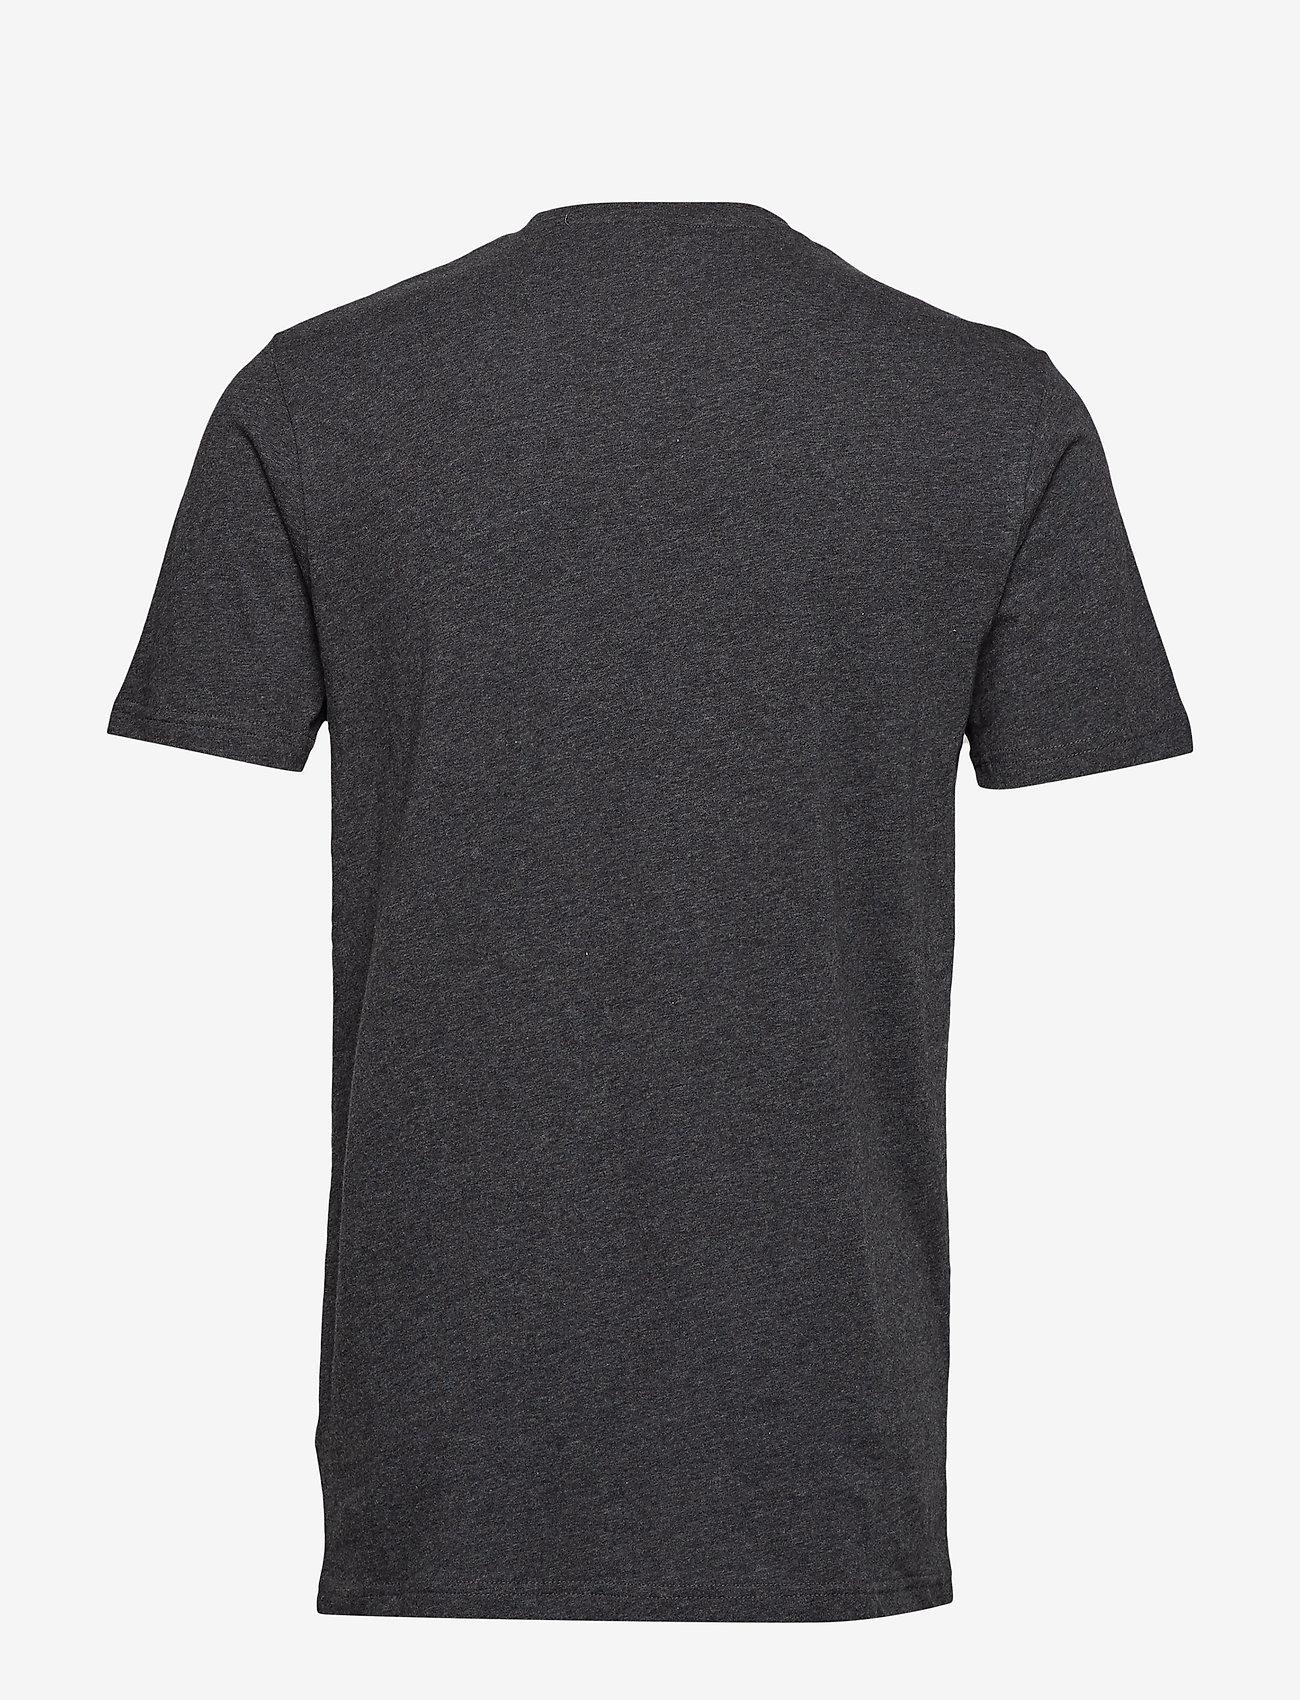 Ellesse EL PRADO (NEW LOGO) - T-skjorter DARK GREY MARL - Menn Klær